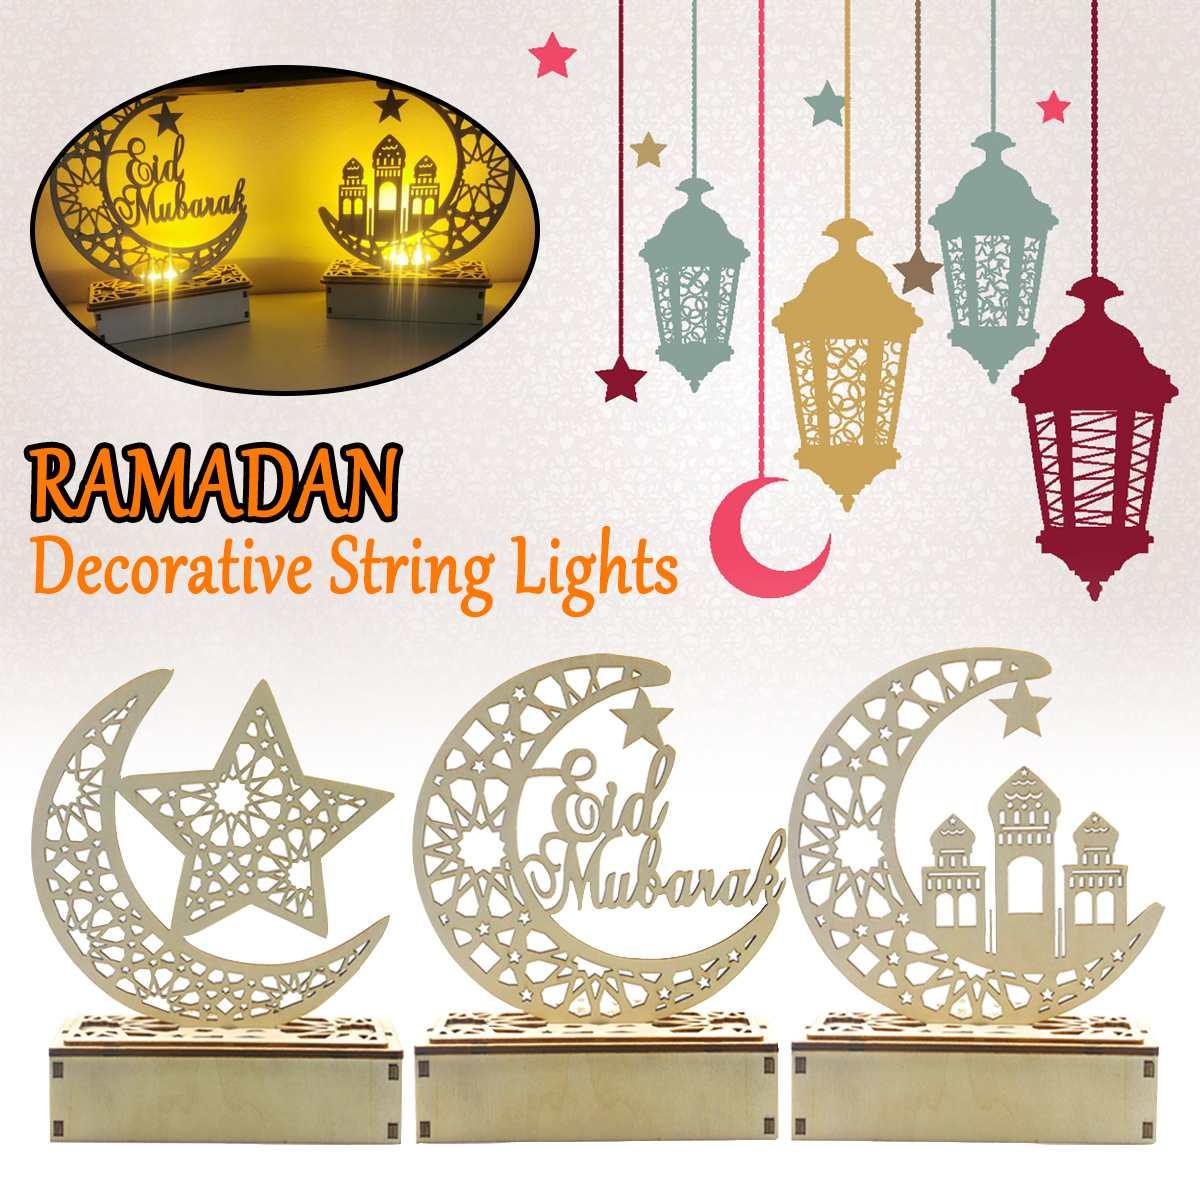 Cadena de luces, lámpara de palacio estéreo Ramadán LED Eid Mubarak, decoración decorativa, cadena de luces Kareem, accesorios de decoración Musli